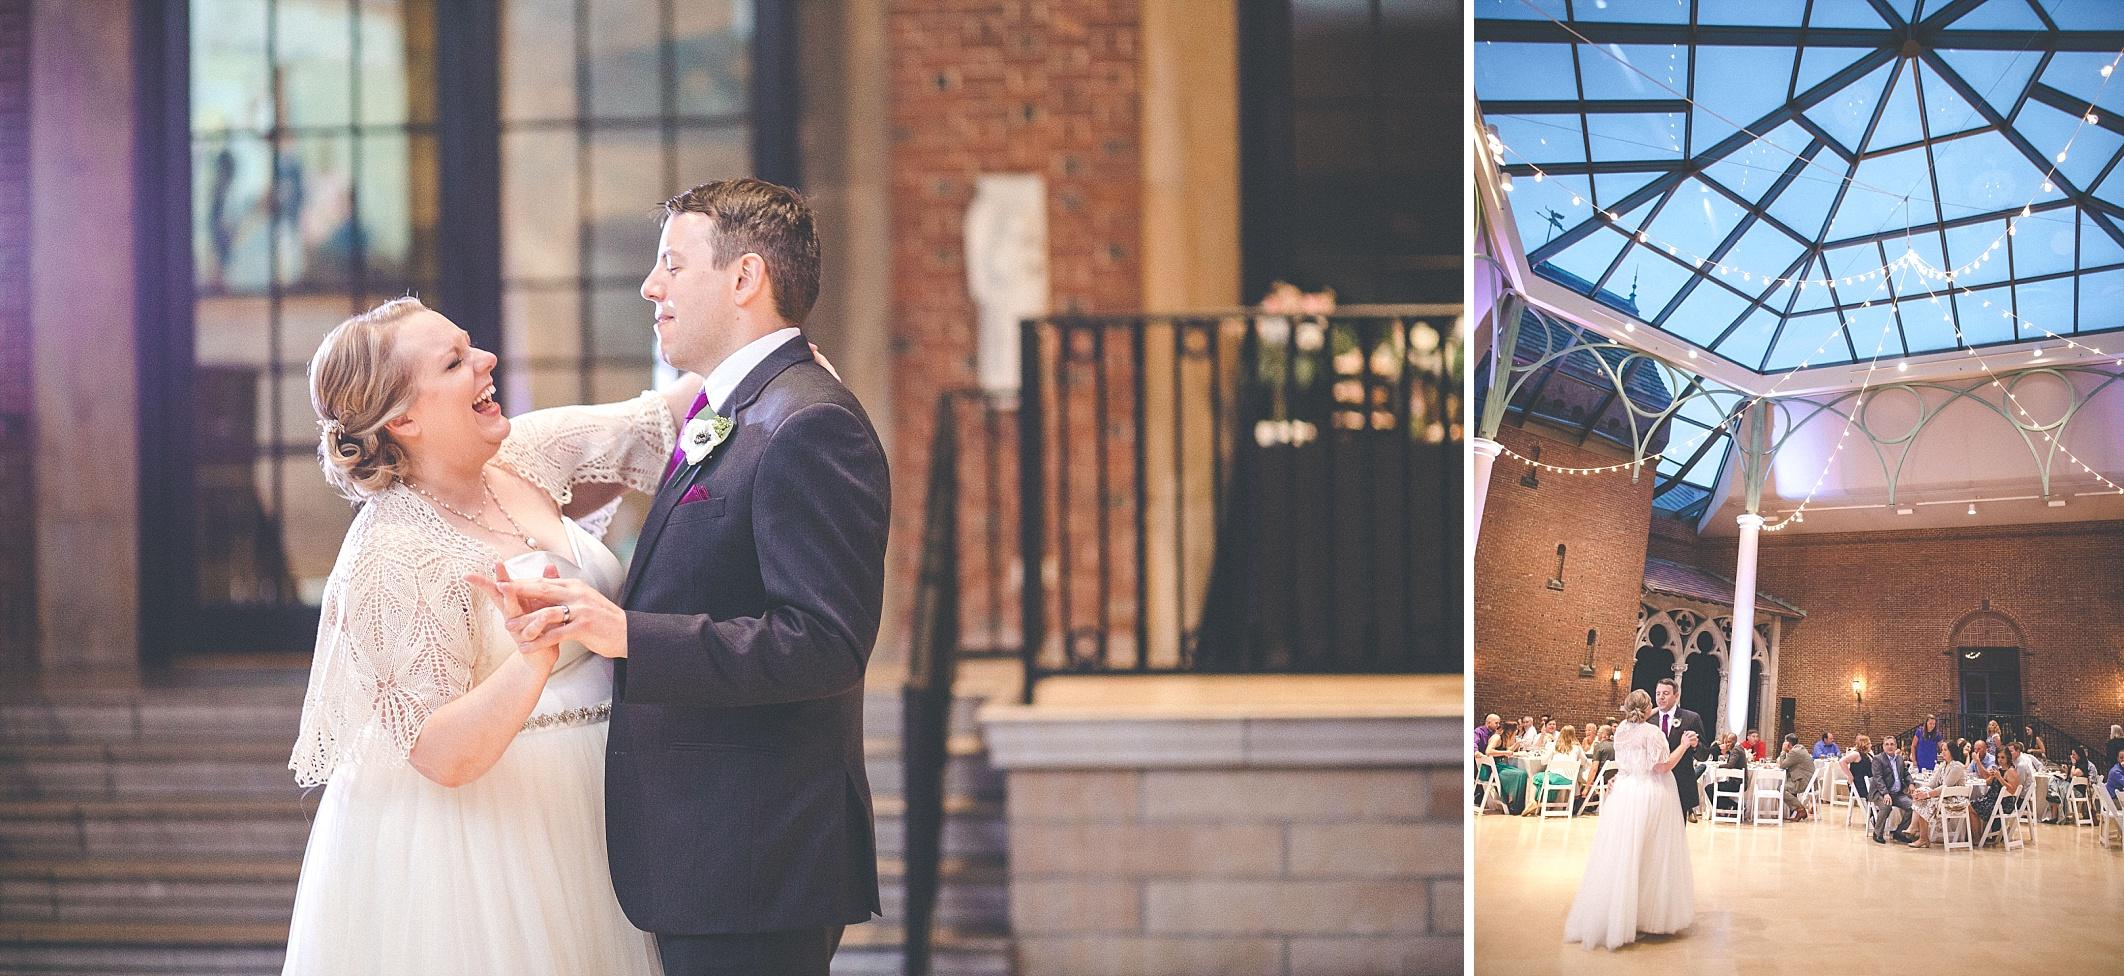 wedding-photographer-dayton-ohio_0023.jpg